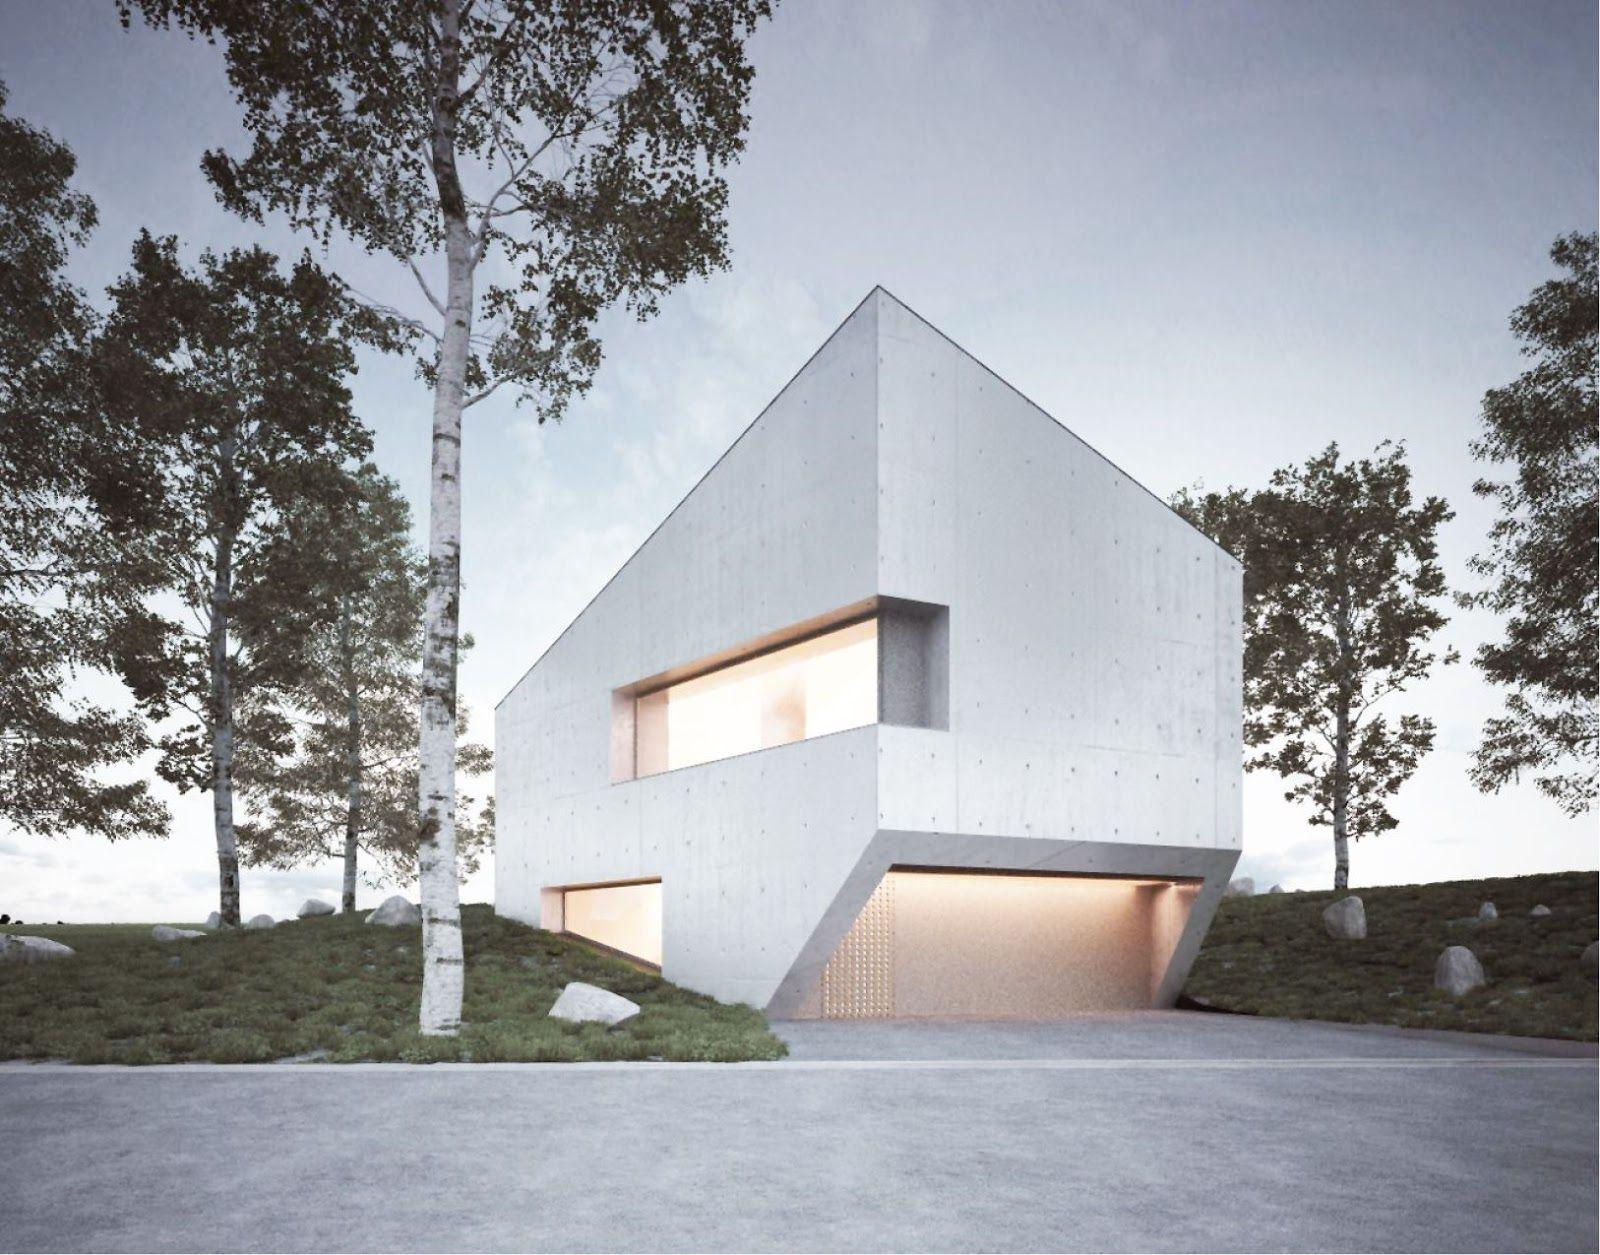 a f a s i a: Steimle Architekten